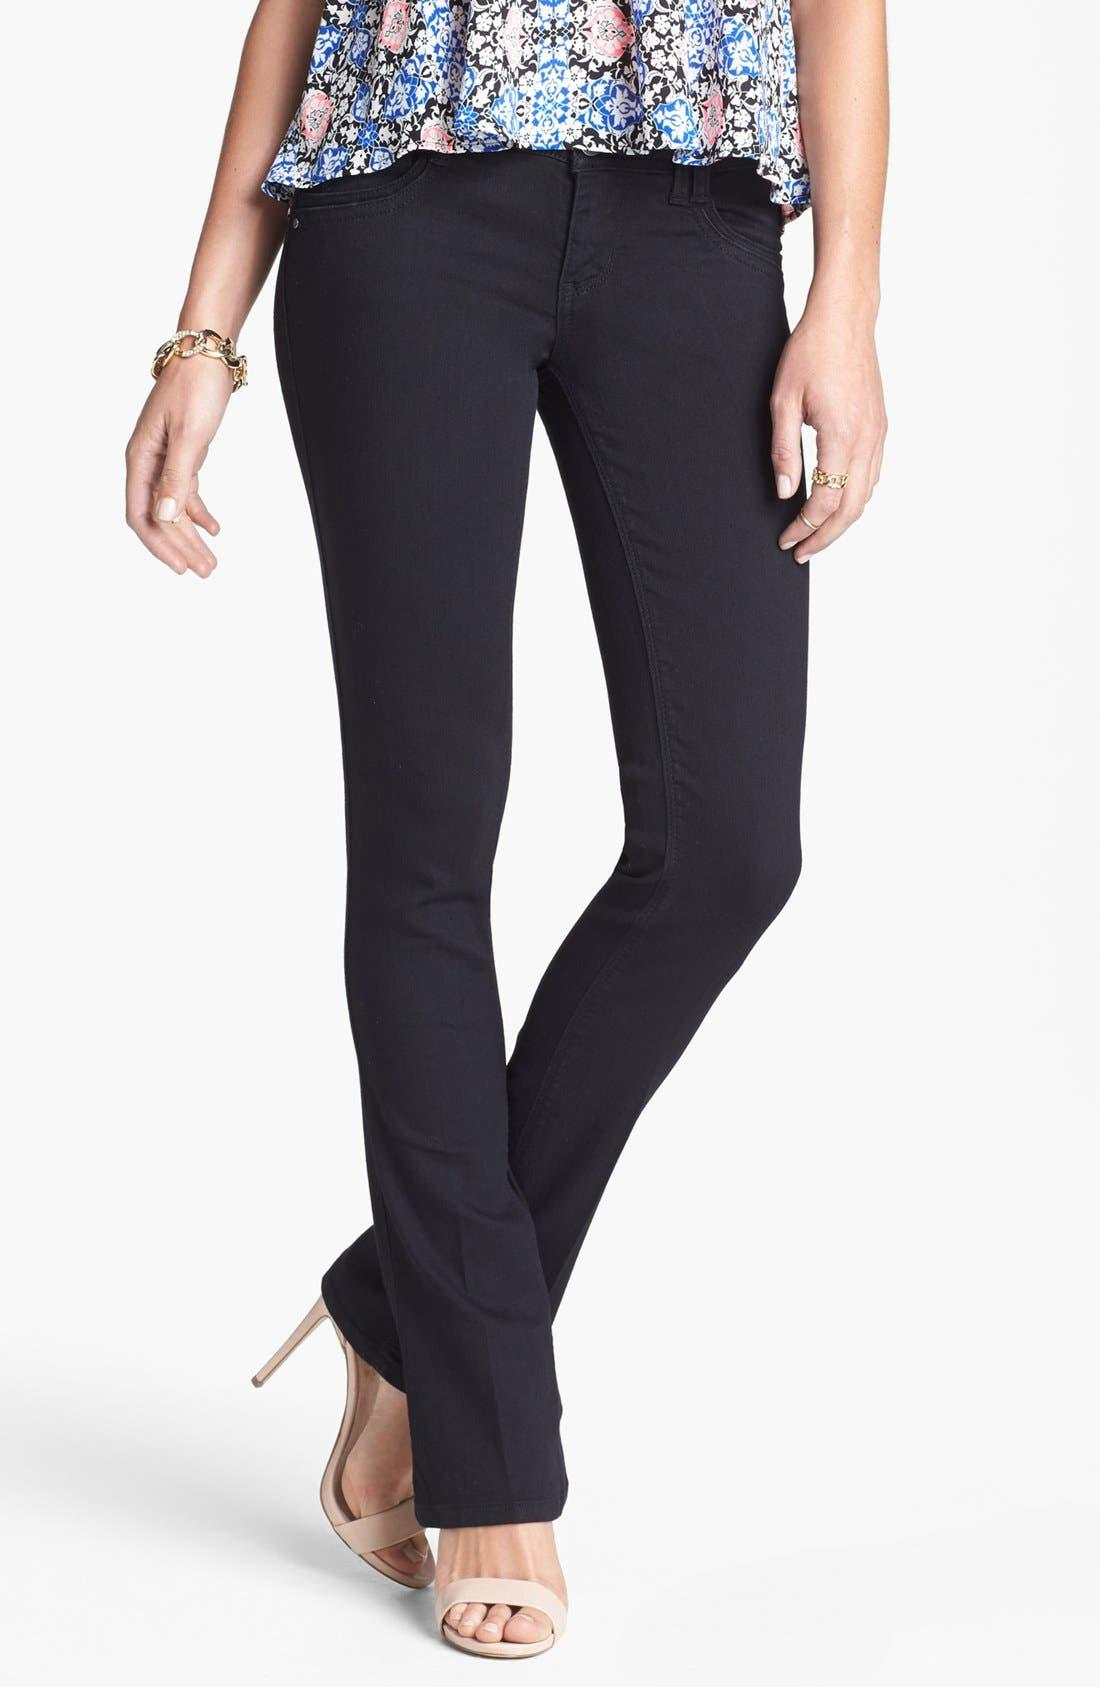 Alternate Image 1 Selected - Jolt Stretch Bootcut Jeans (Black) (Juniors) (Online Only)